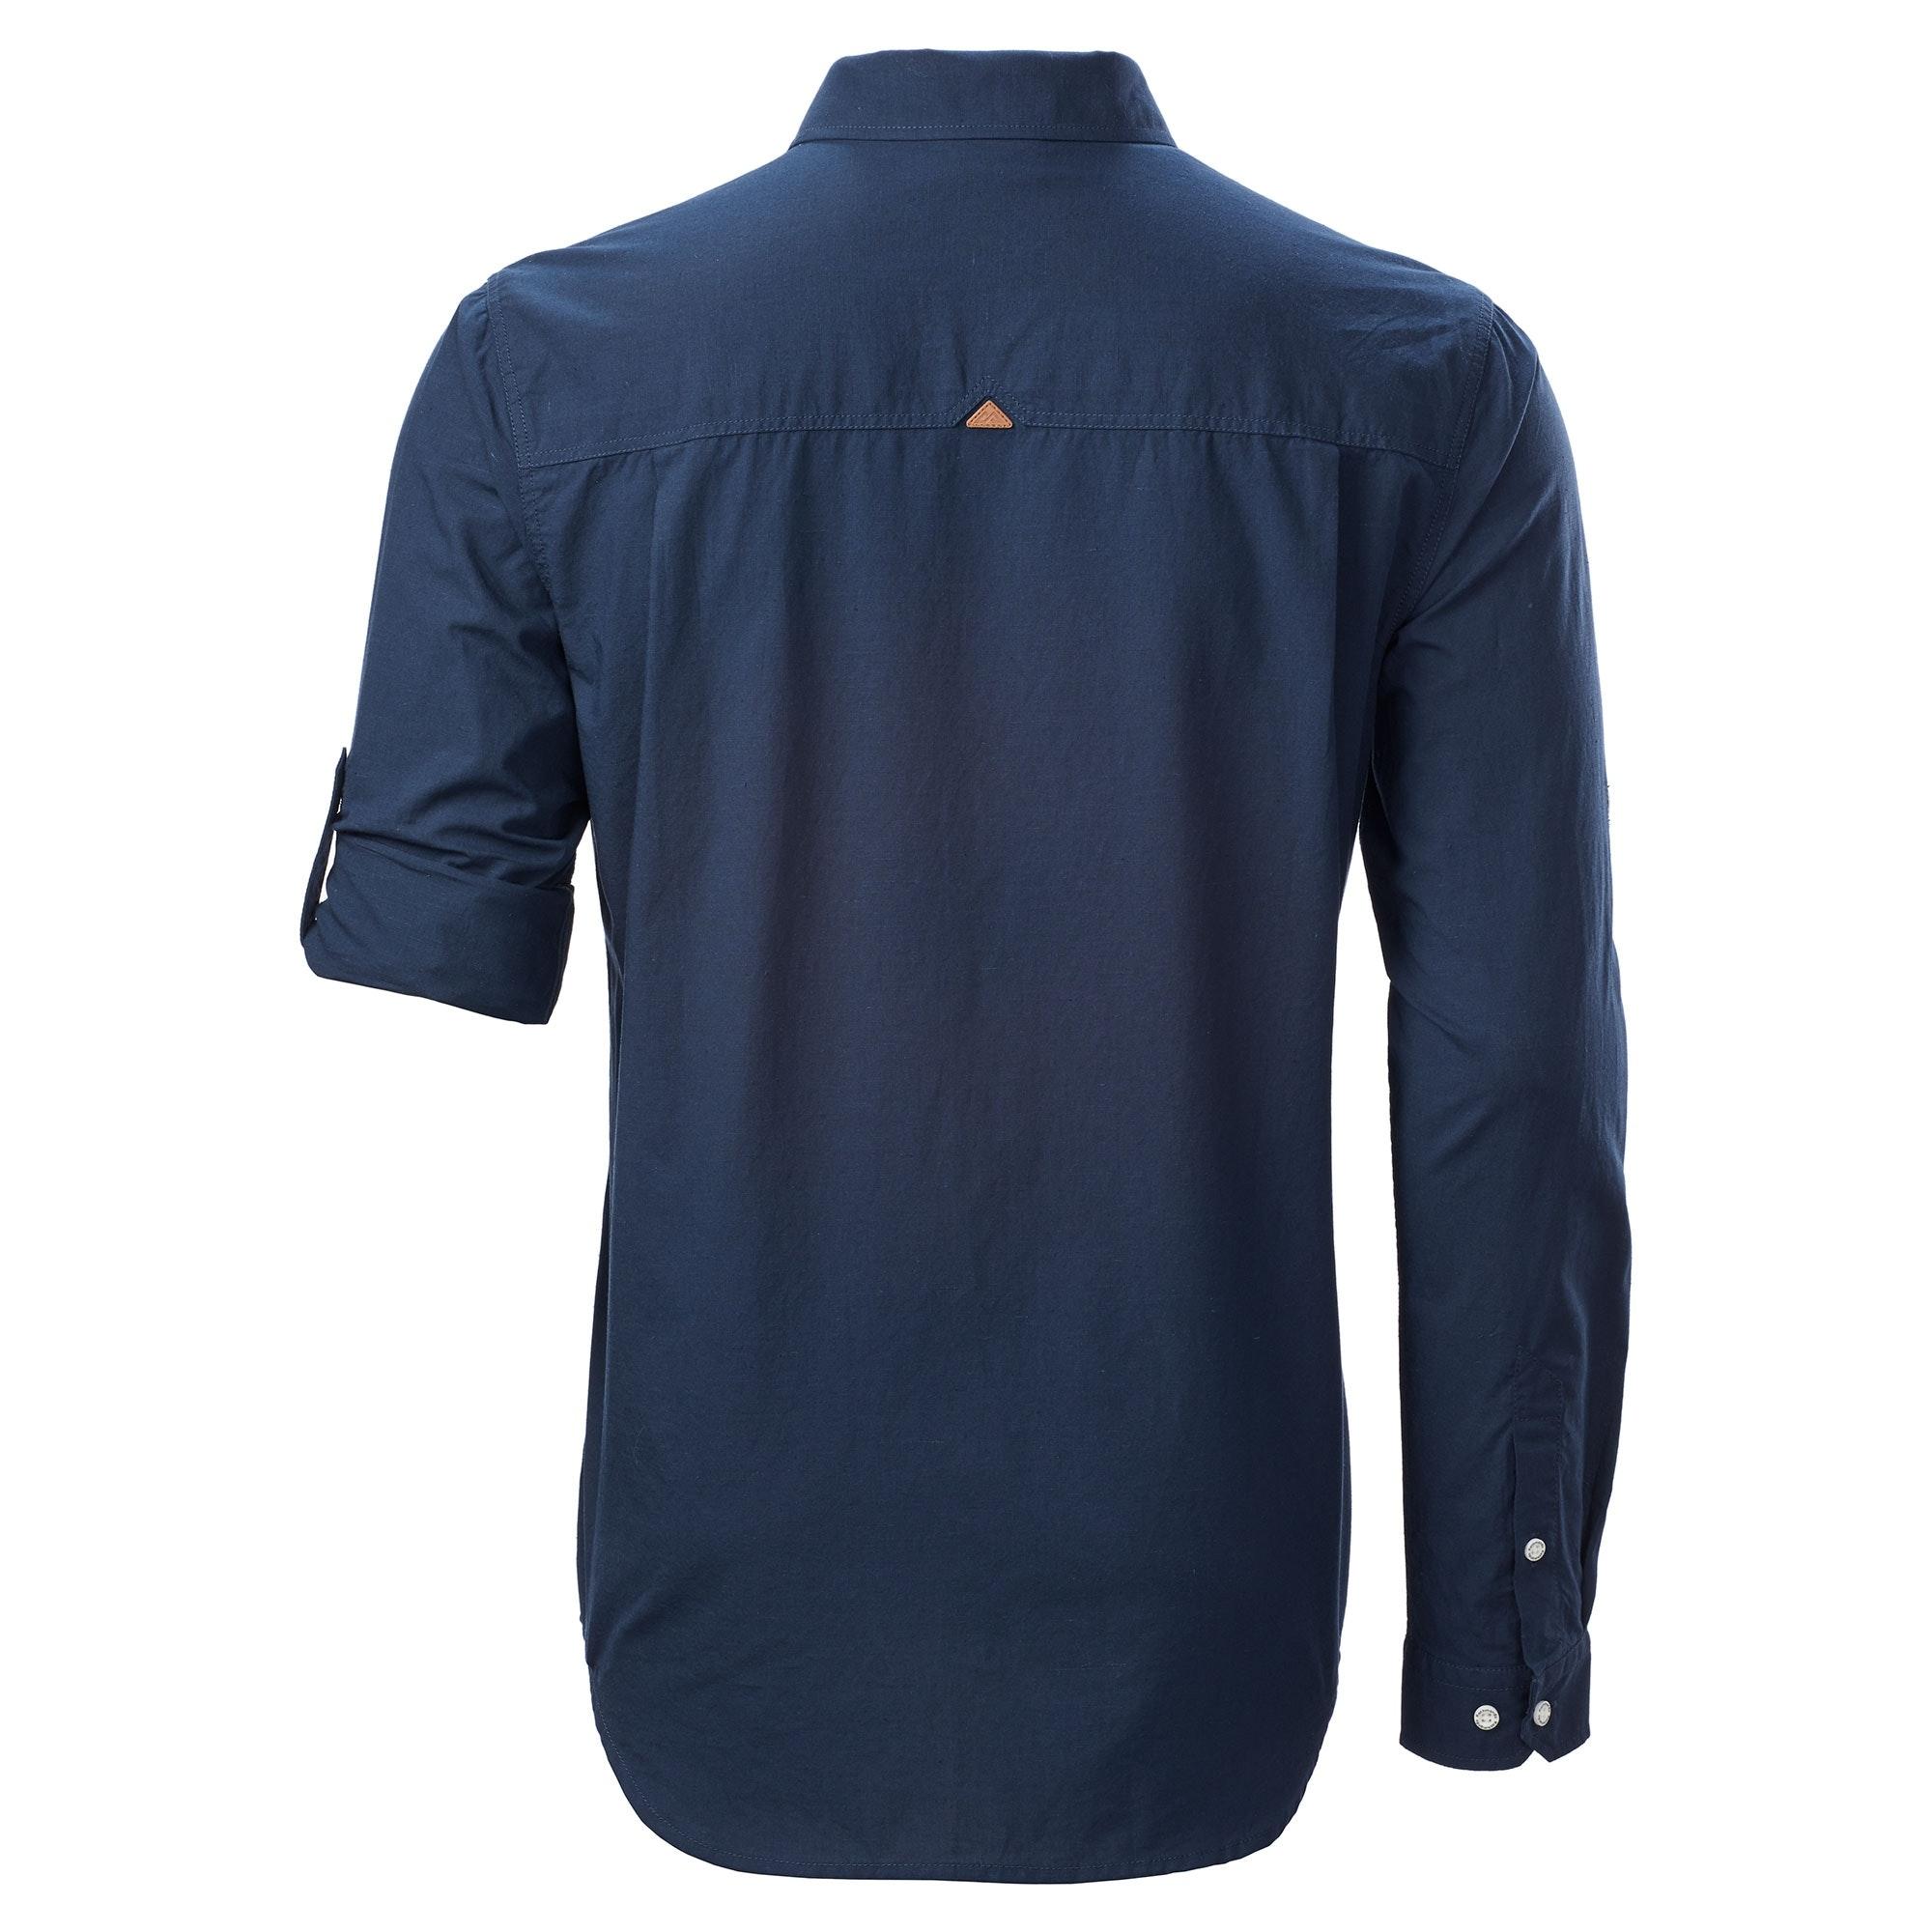 NEW-Kathmandu-Federate-Mens-Long-Sleeve-Button-Top-Casual-Urban-Travel-Shirt